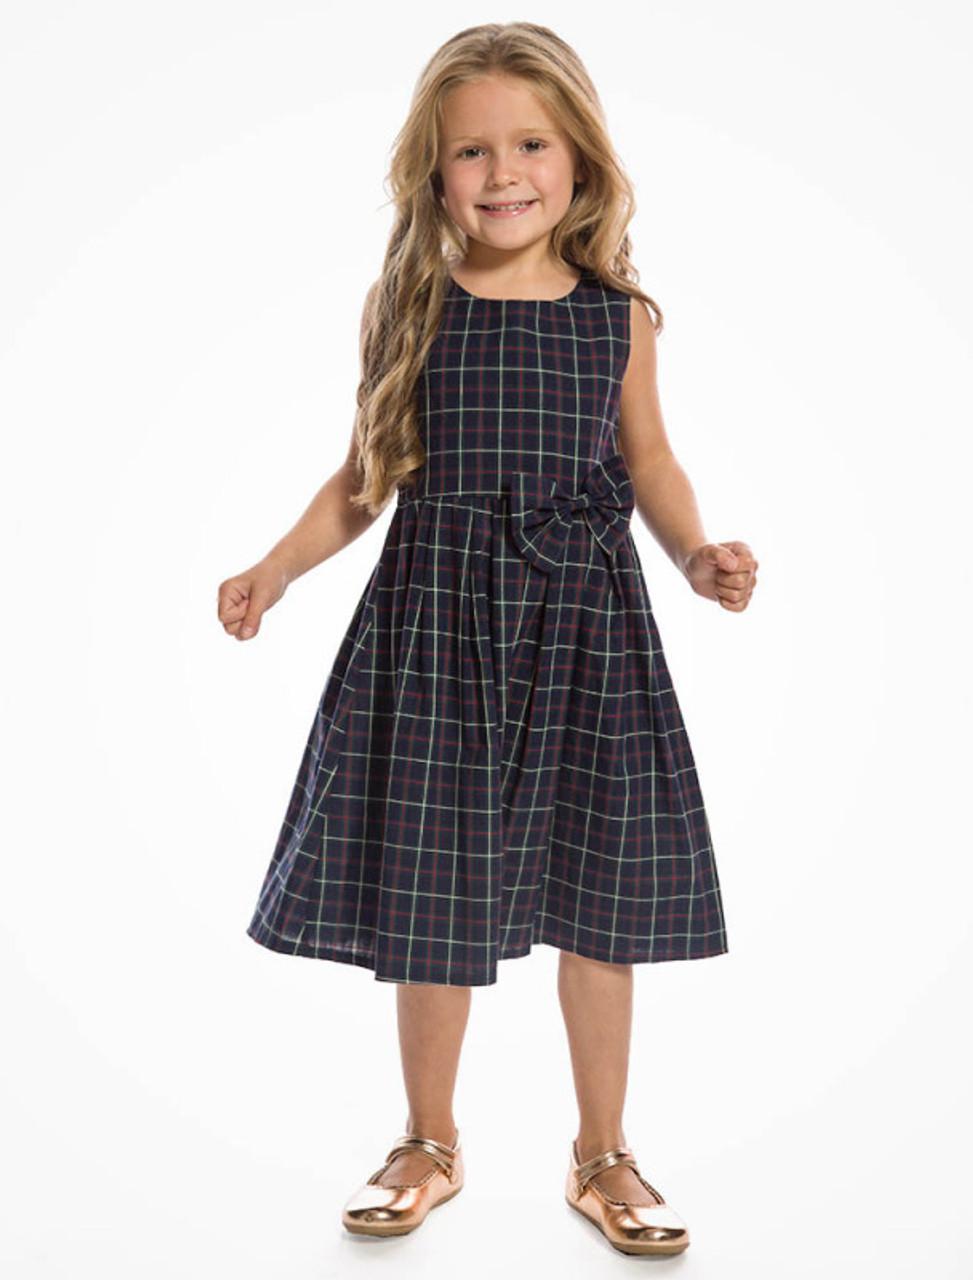 cdfdc2222d999 Lindy Bop Mini Grace Children's Navy Check Print Swing Dress ...